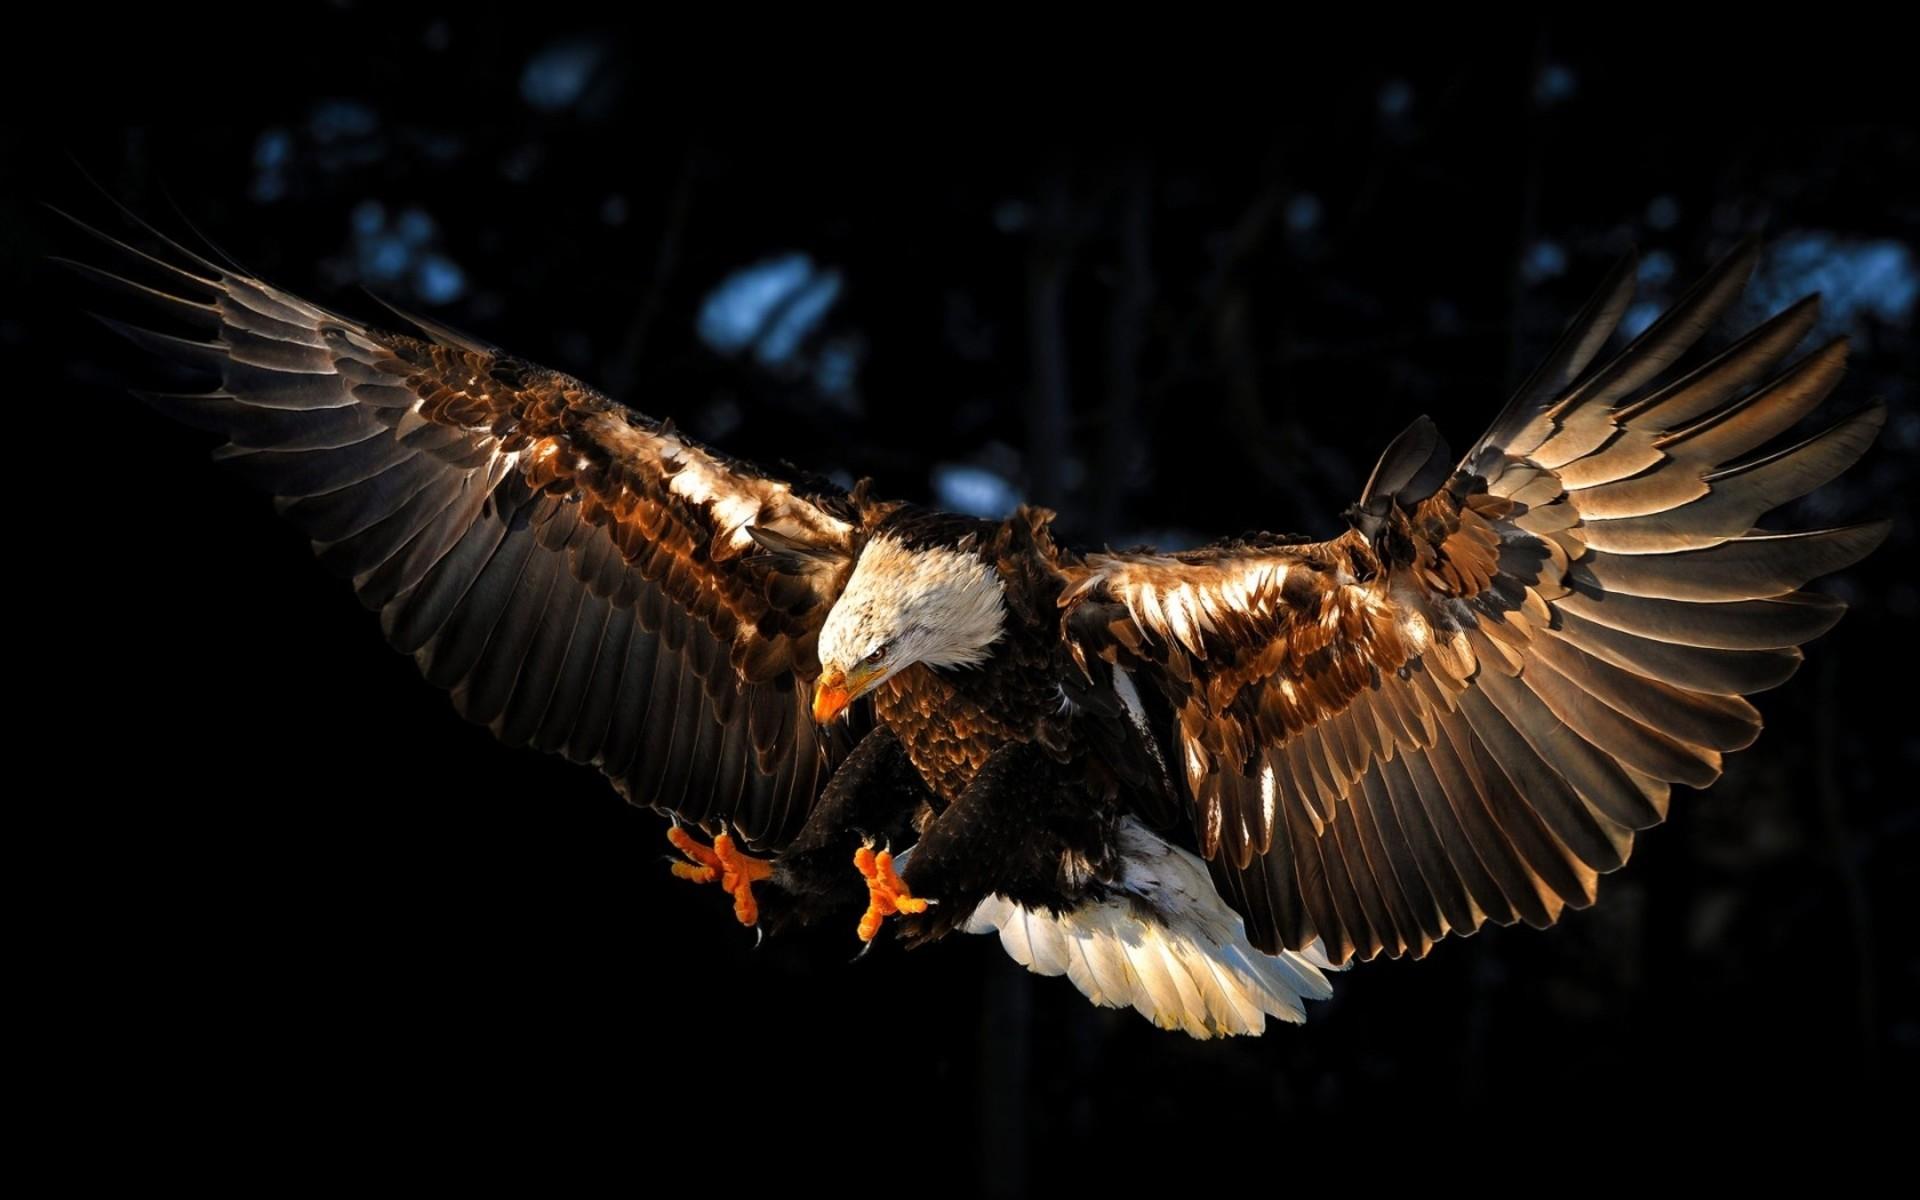 Top 25+ best Eagle wallpaper ideas on Pinterest   Eagles, American eagle  flights and Bald eagle